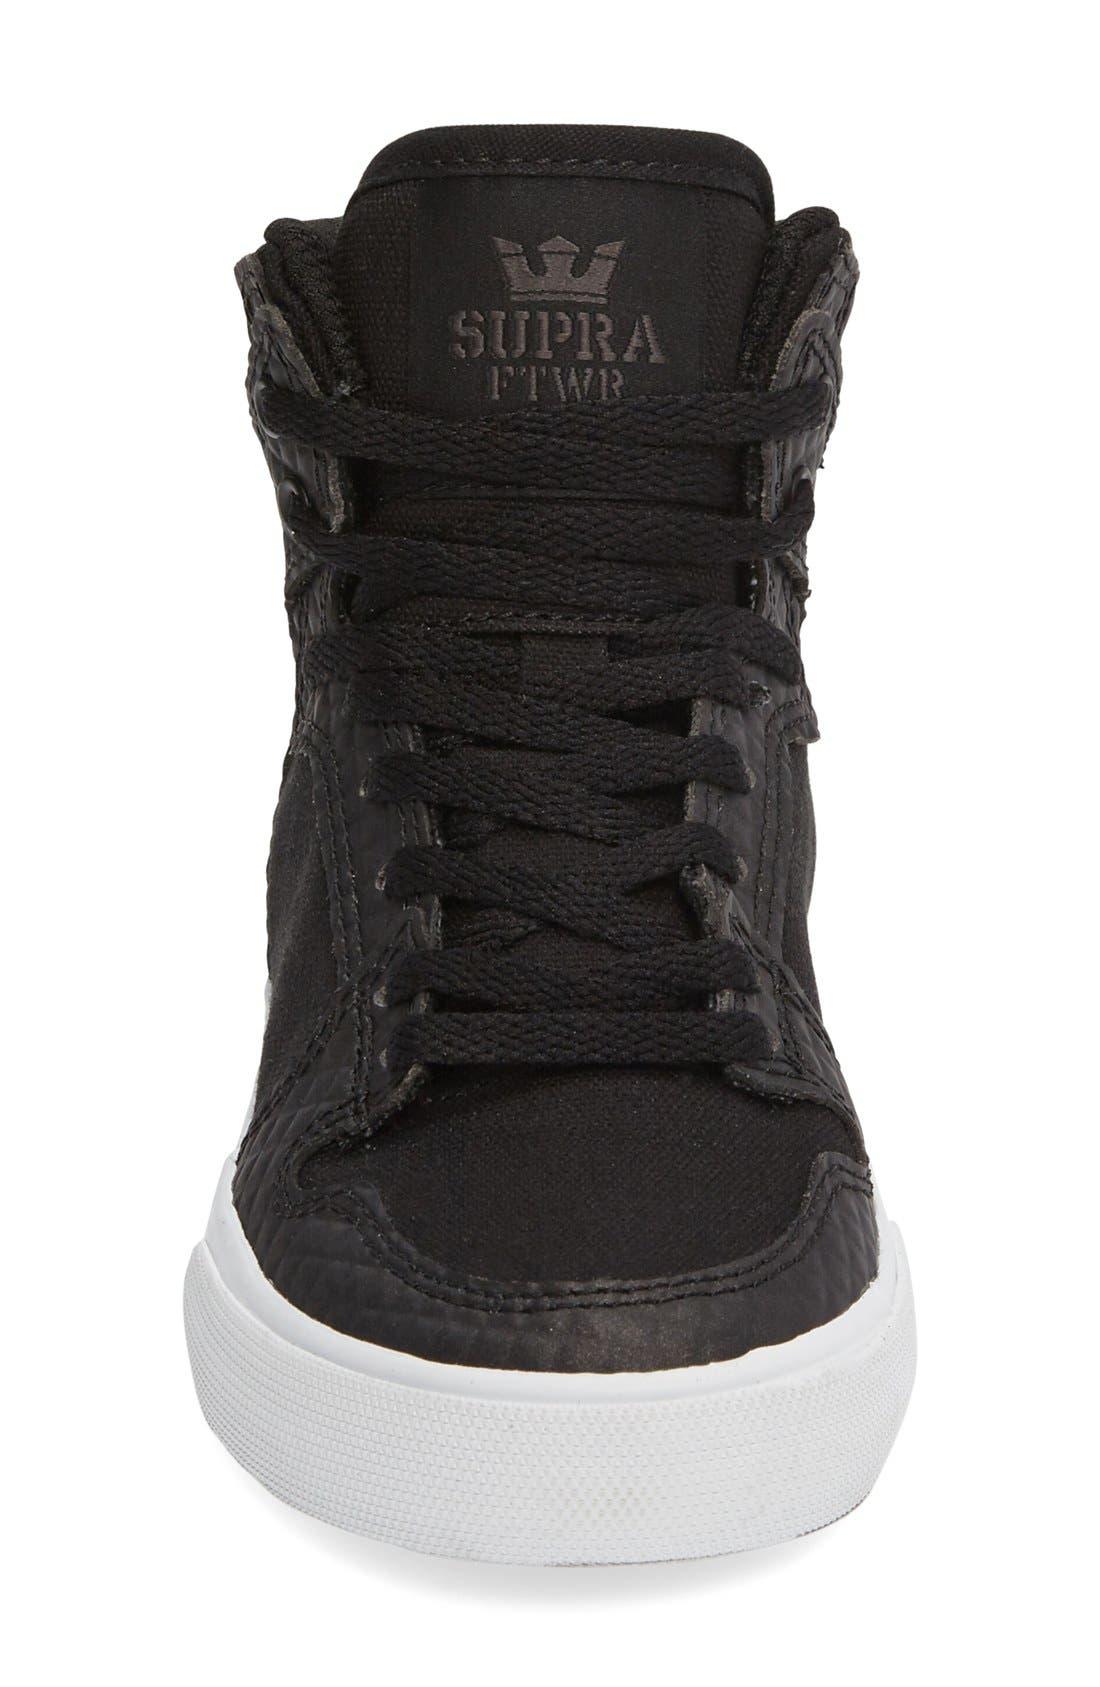 Alternate Image 3  - Supra 'Vaider' High Top Sneaker (Walker, Toddler, Little Kid & Big Kid)